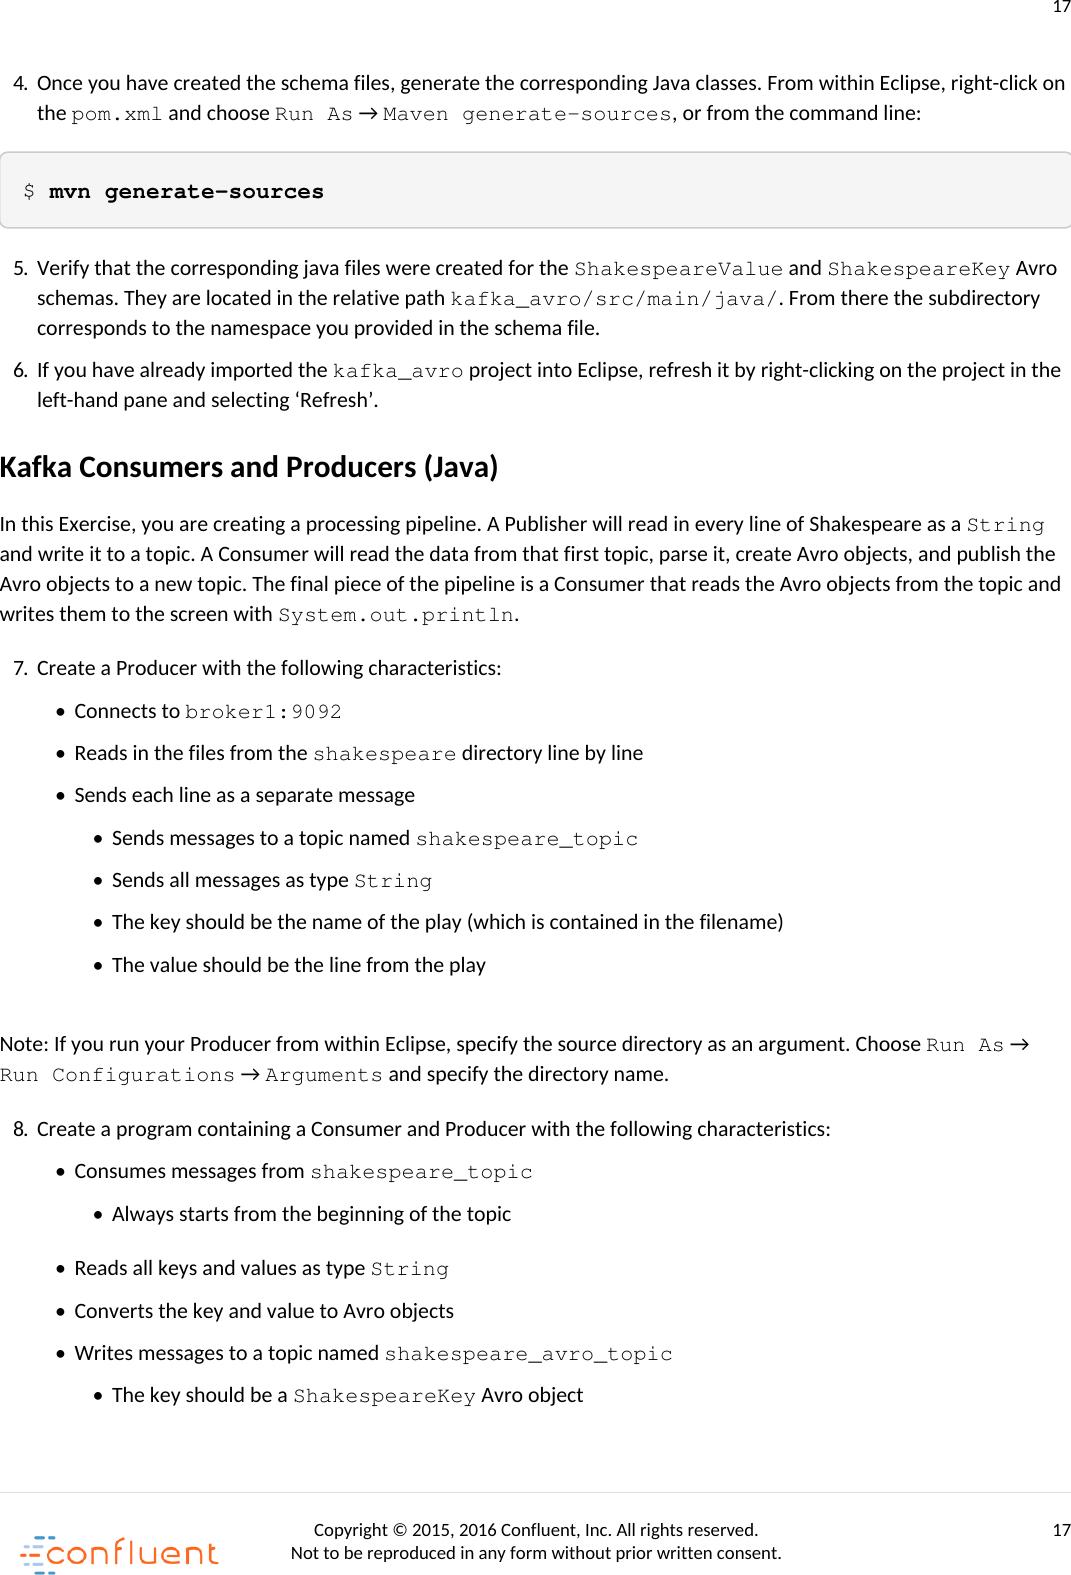 Confluent Developer Training Exercise Manual